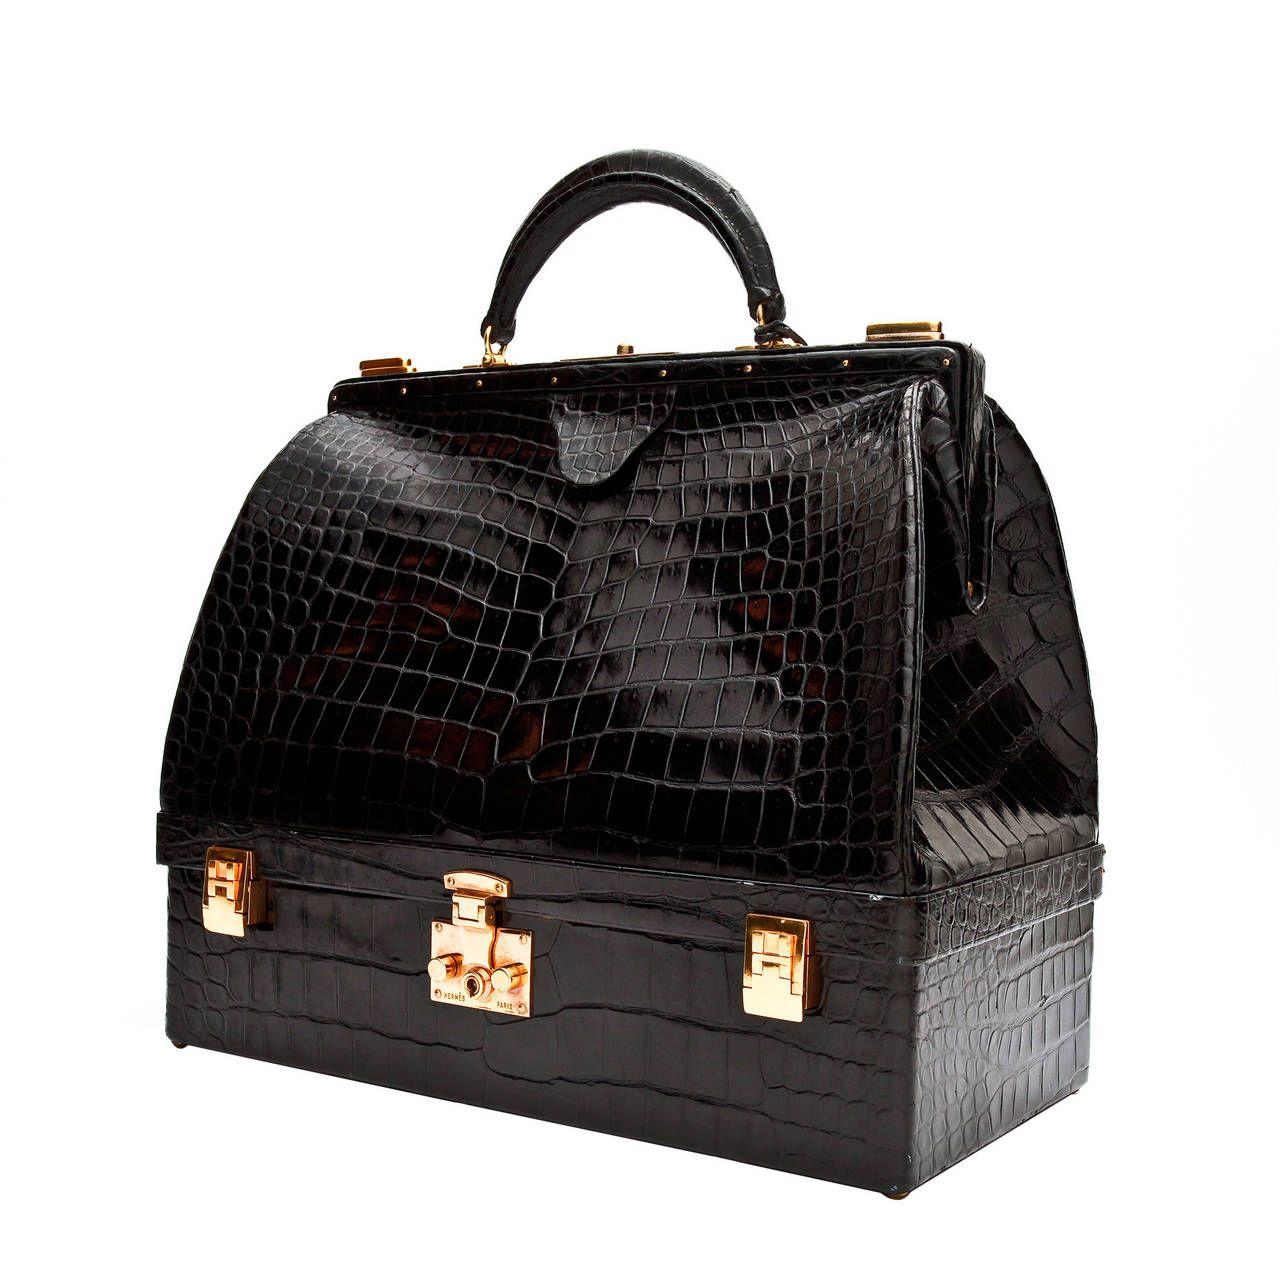 Hermès Black Crocodile Mallette Handbag with Jewel Compartment  bd4421c2c0e49